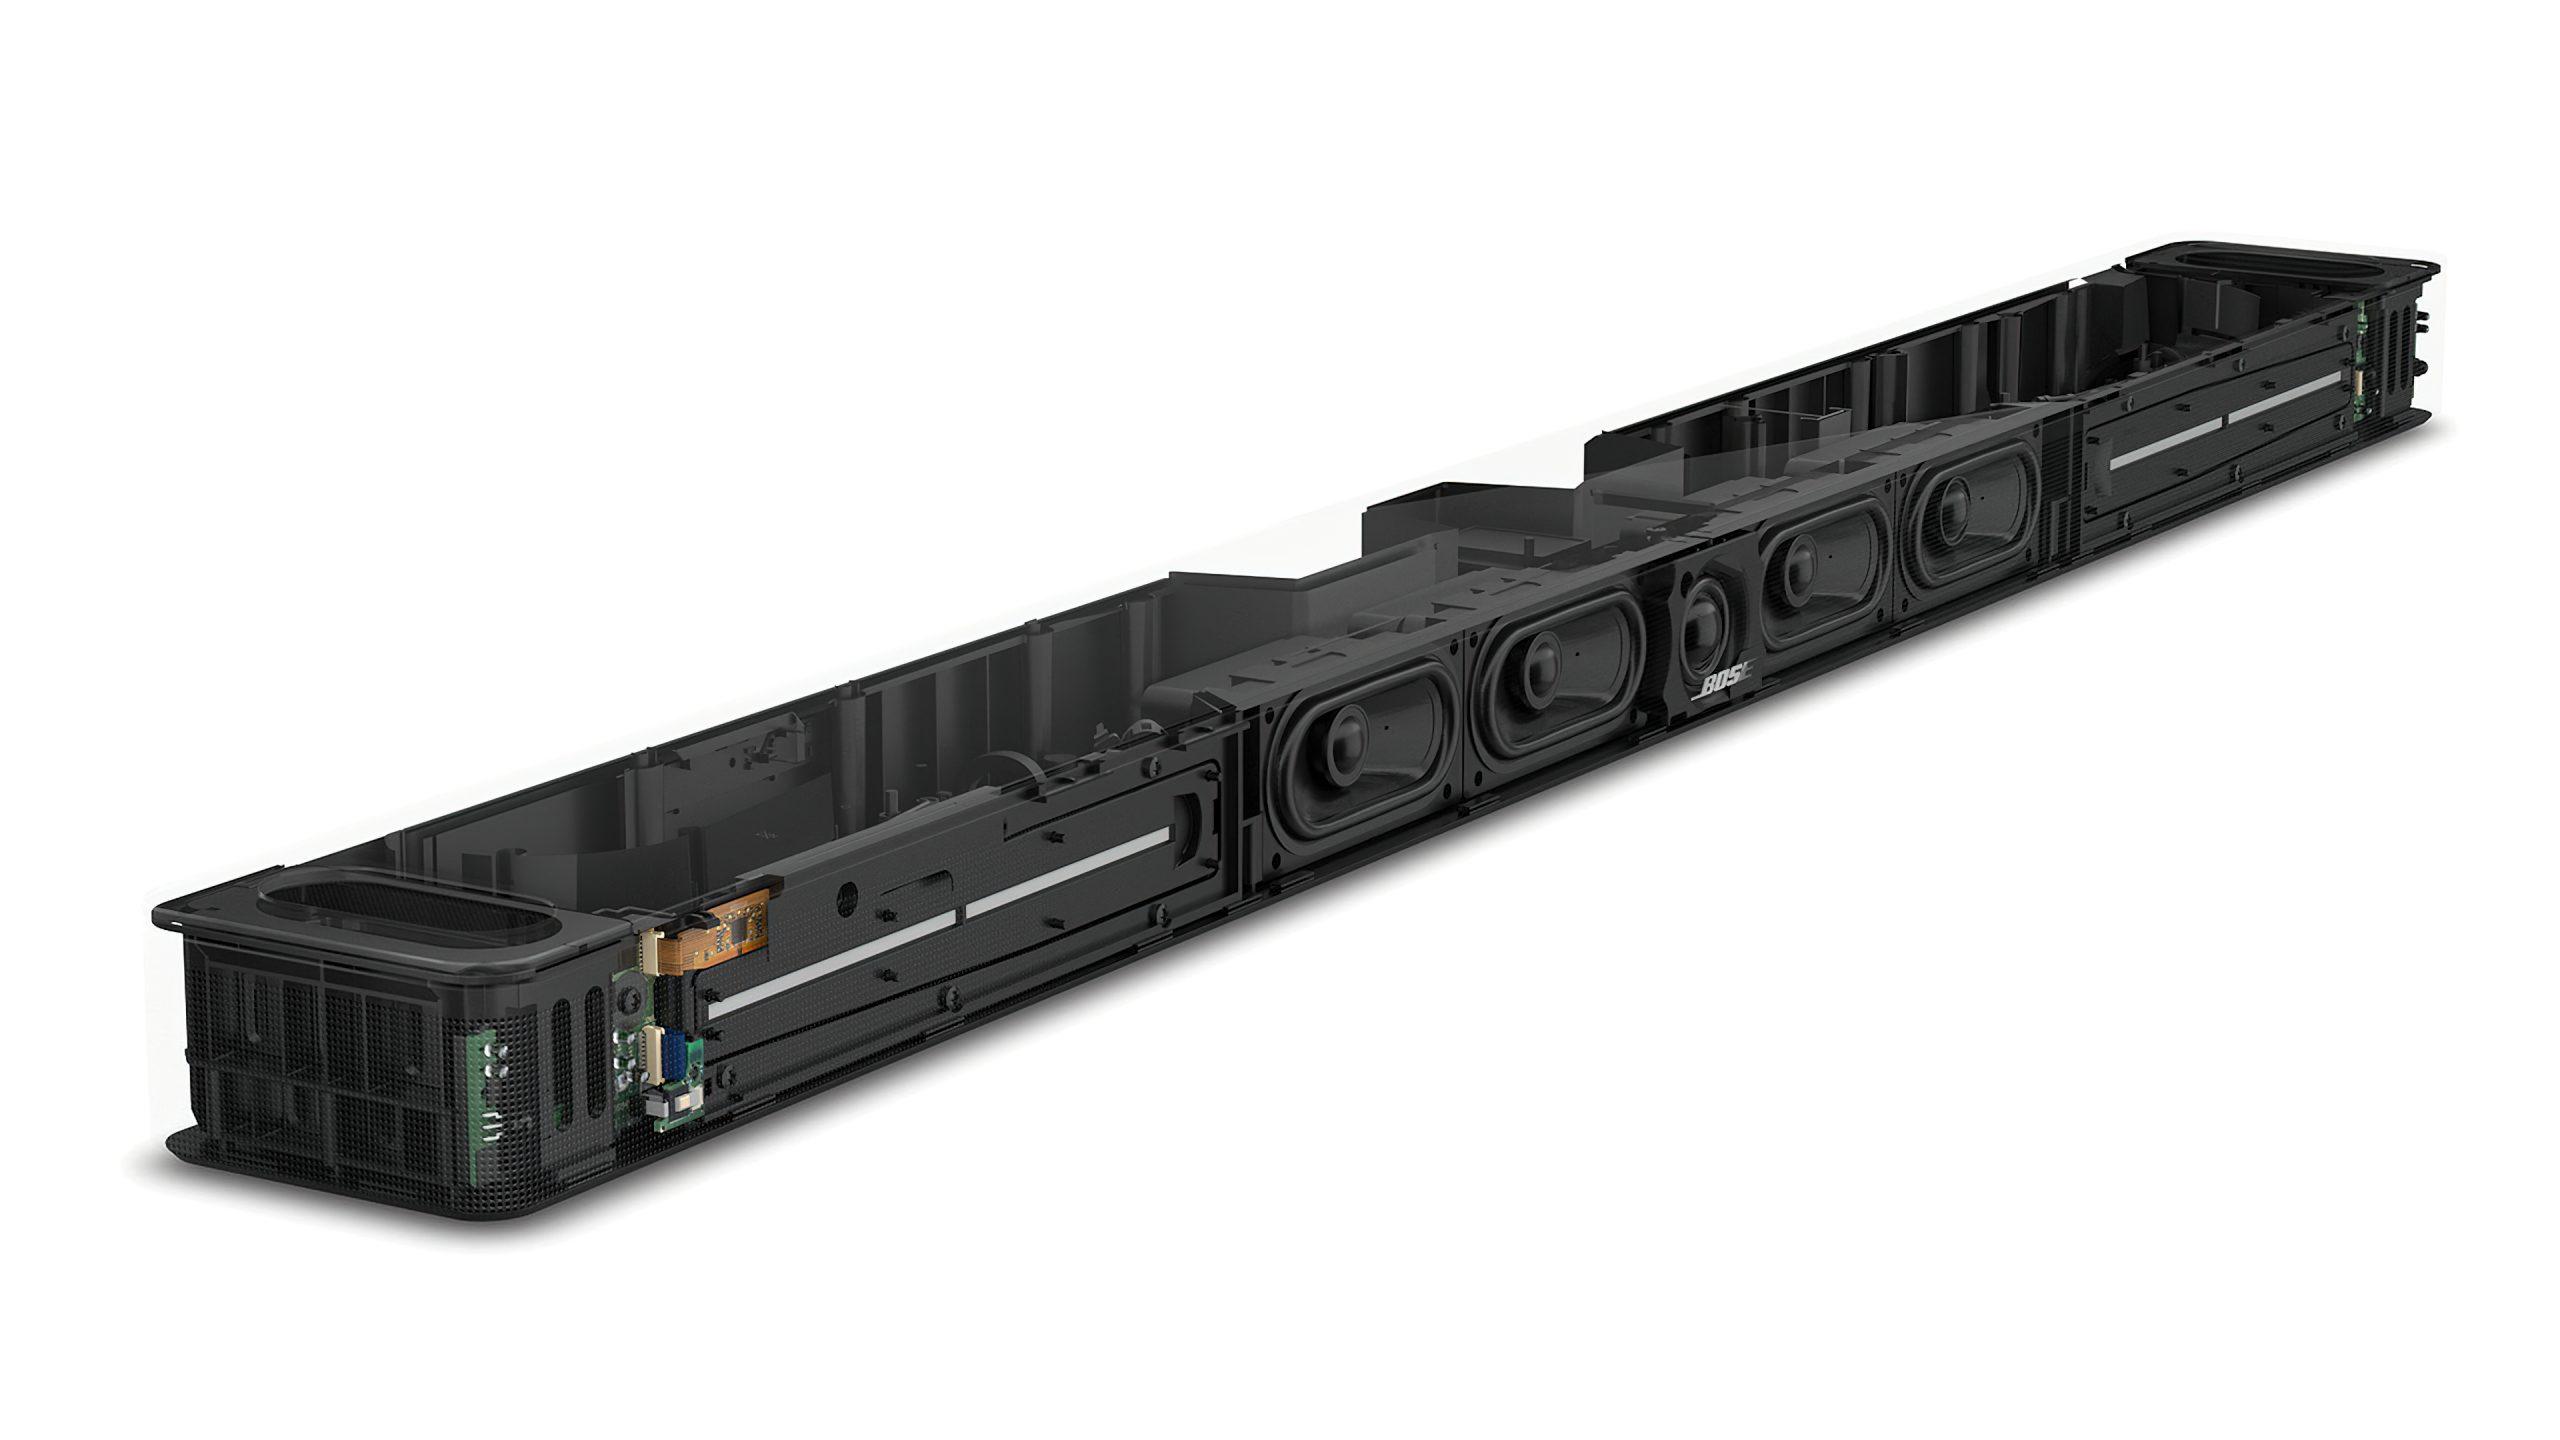 Bose Soundbar 900 exploded